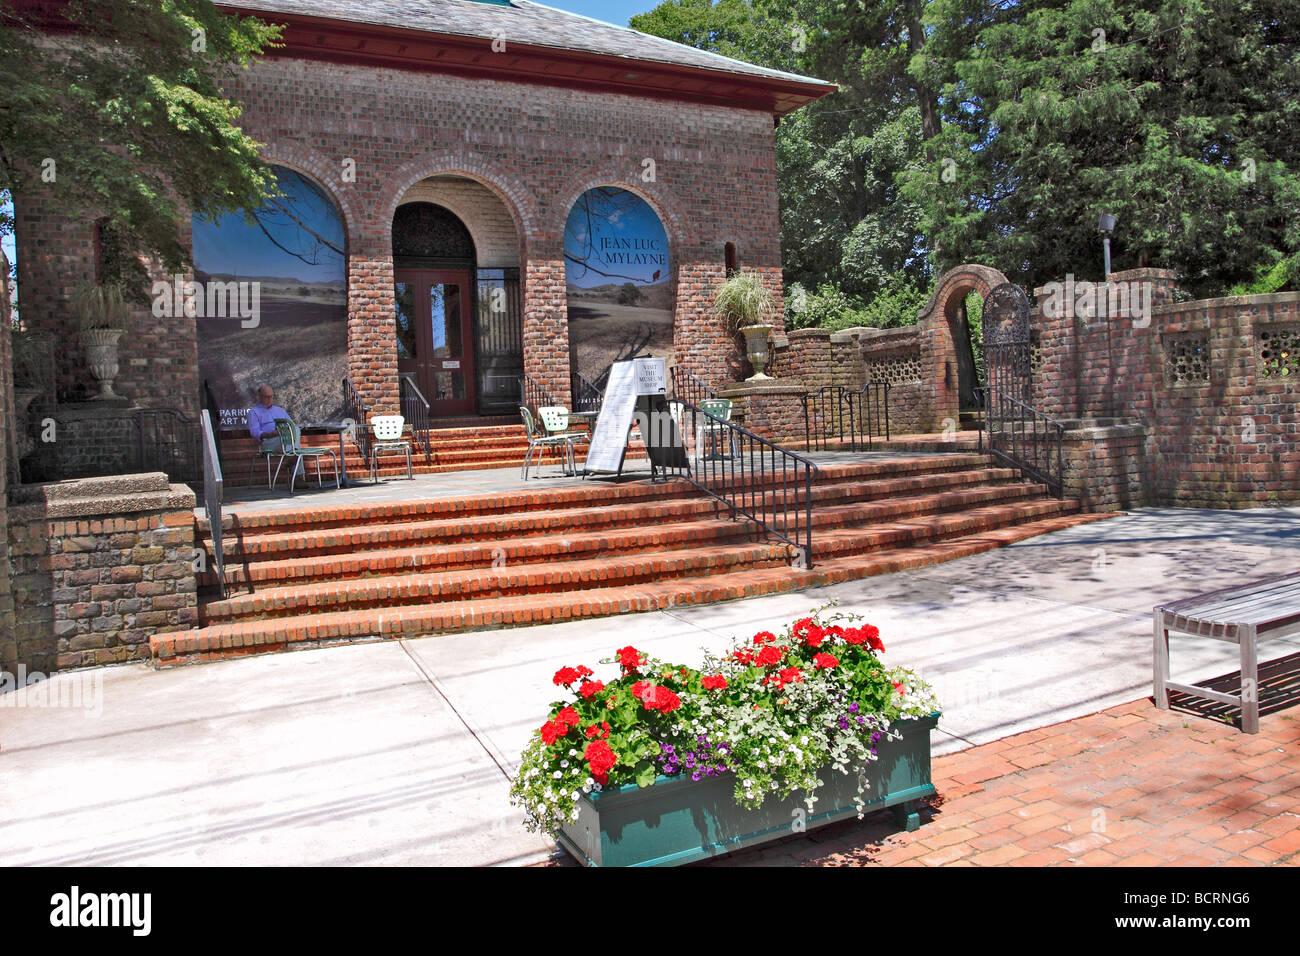 Awesome The Parrish Art Museum Jobs Lane Southampton Long Island NY